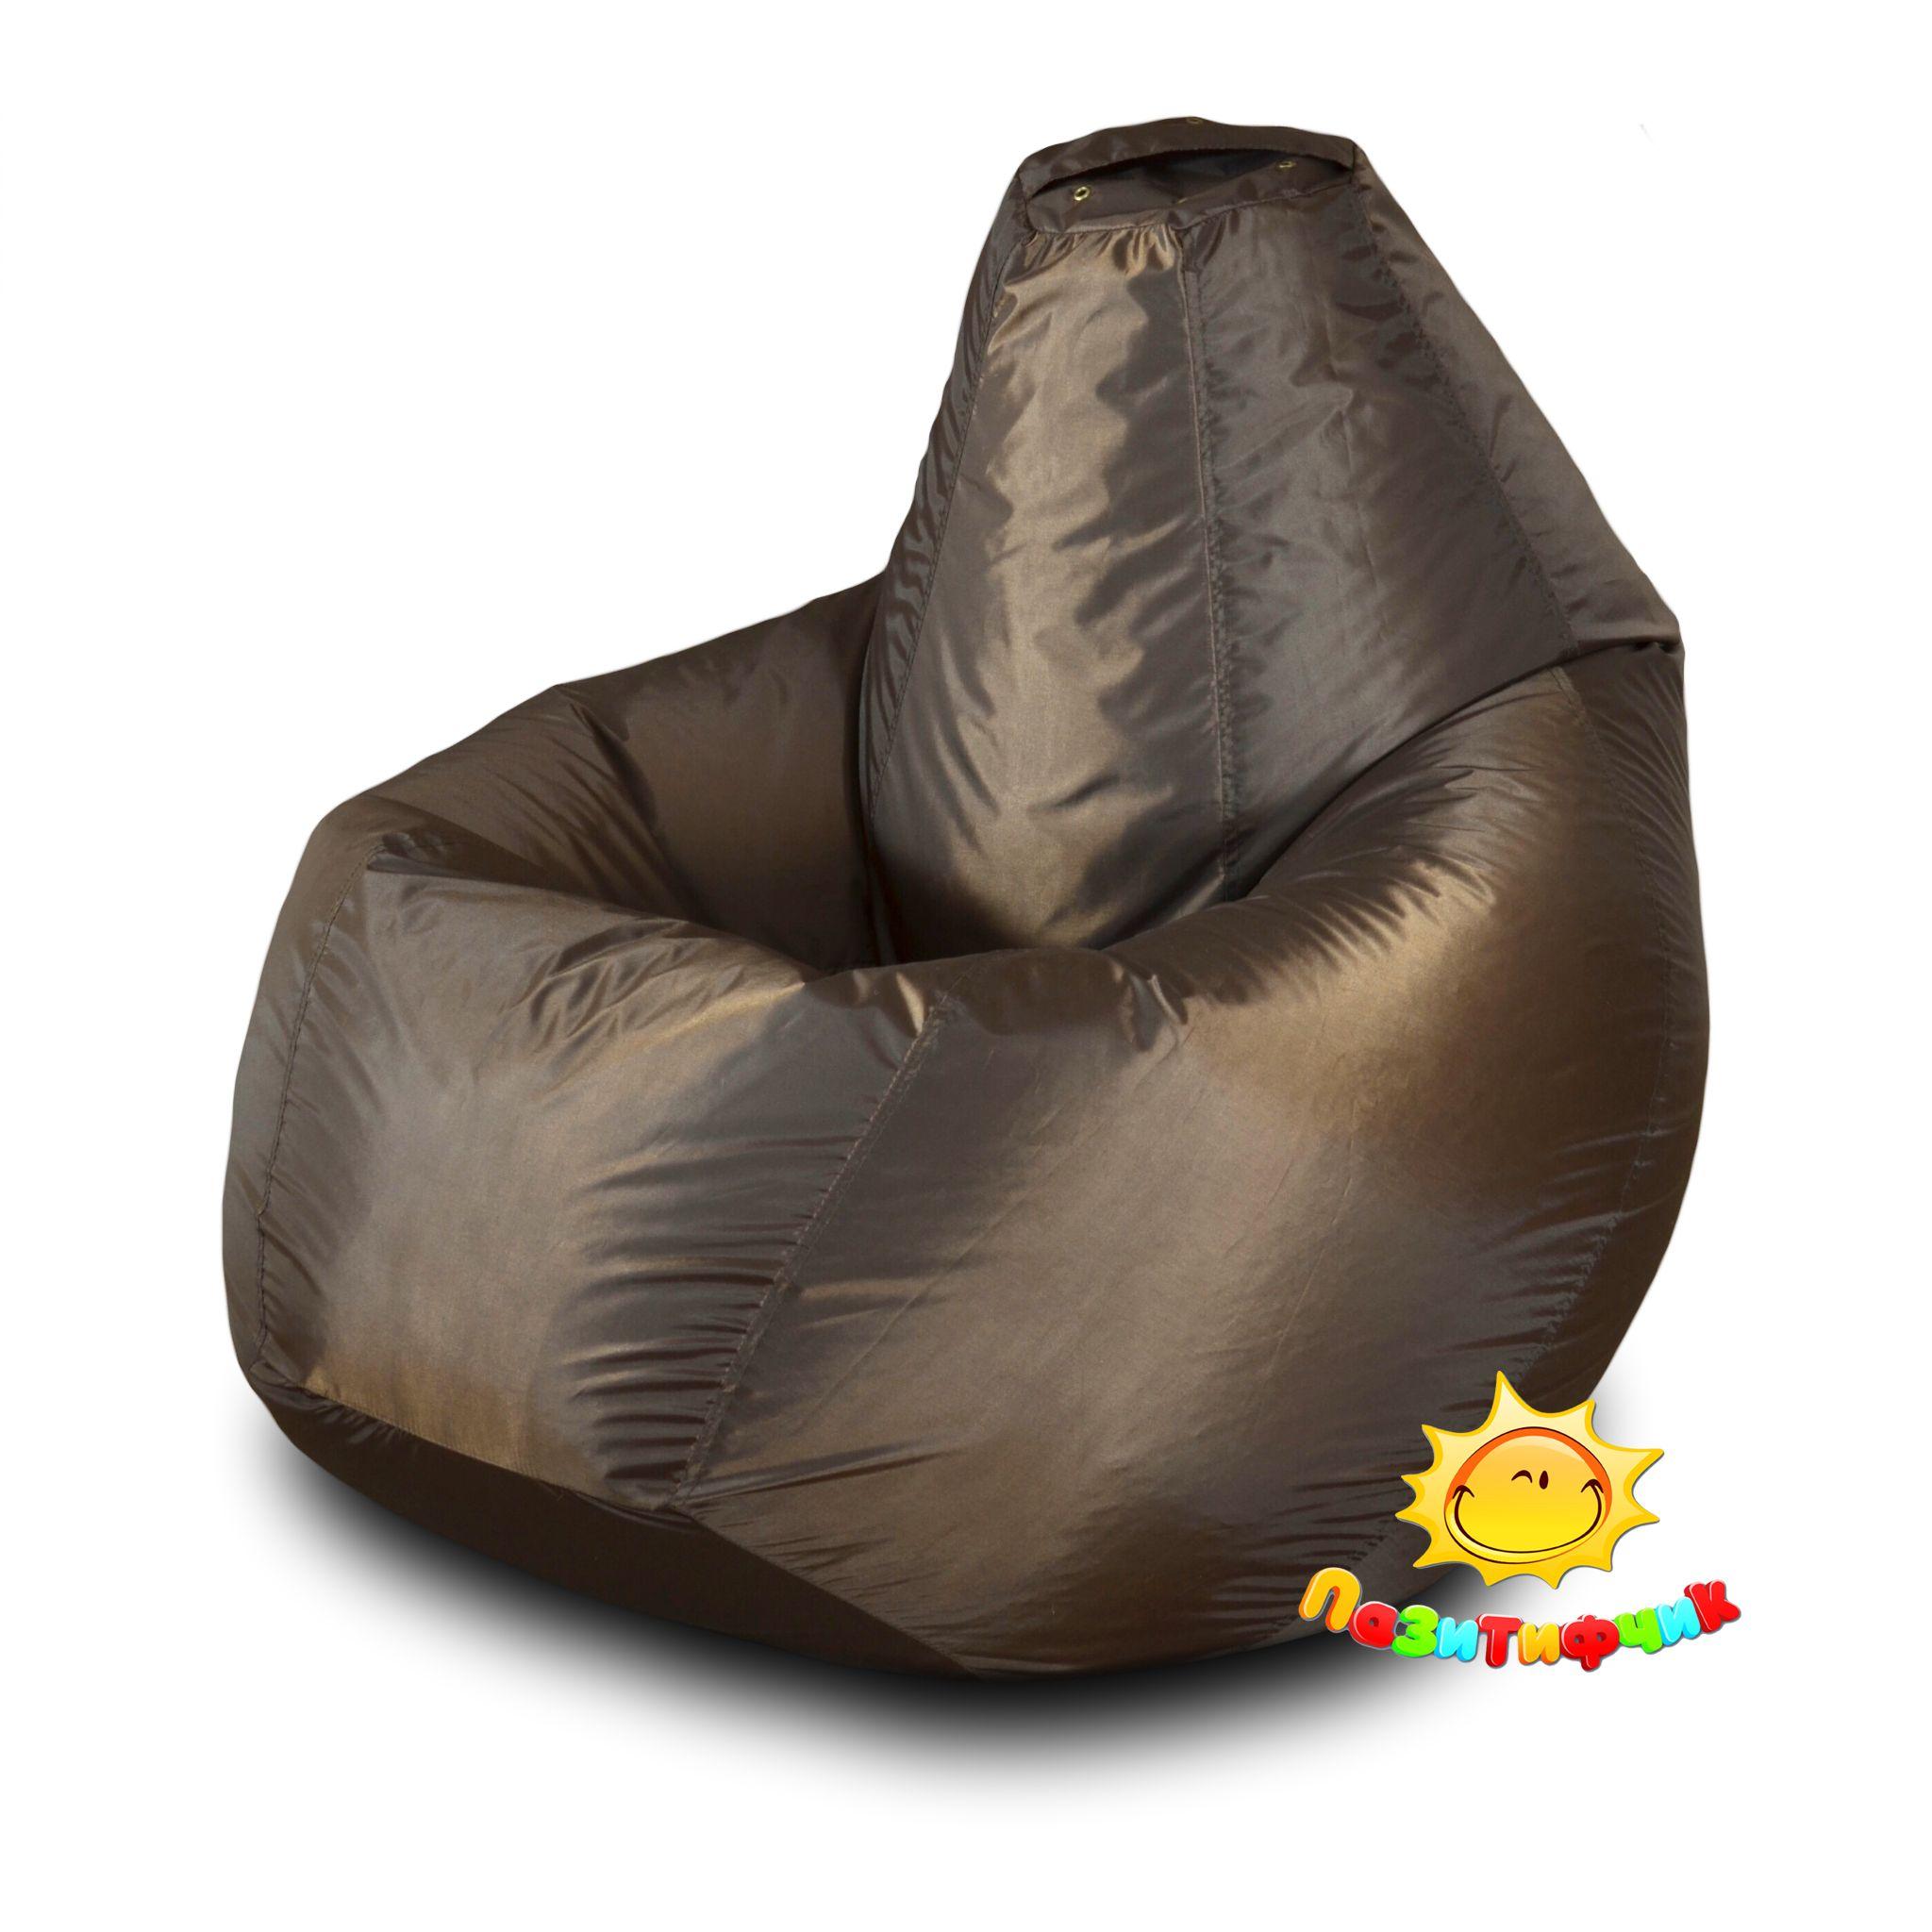 Кресло-мешок Pazitif Груша Пазитифчик, размер L, оксфорд, шоколад фото